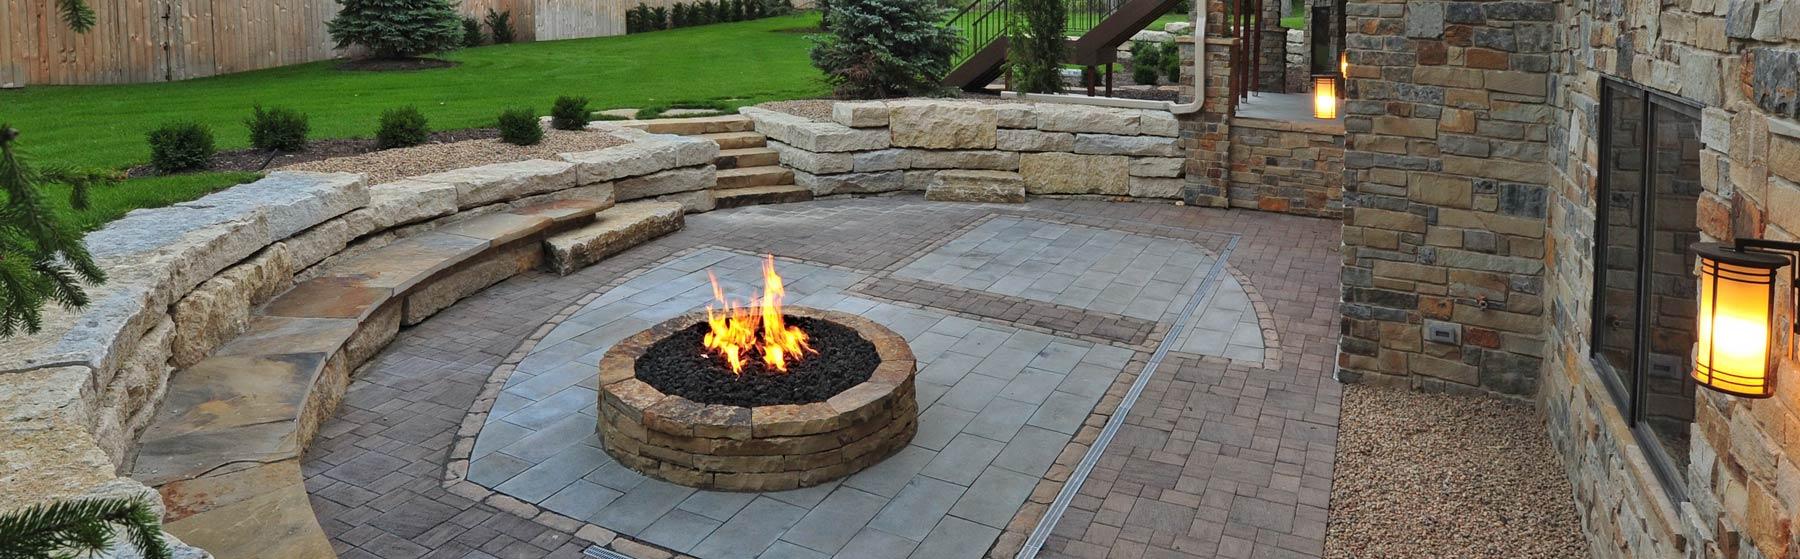 LA-Home-Builders-Lincoln-Nebraska-Backyard-Firepit-1800x559.jpg